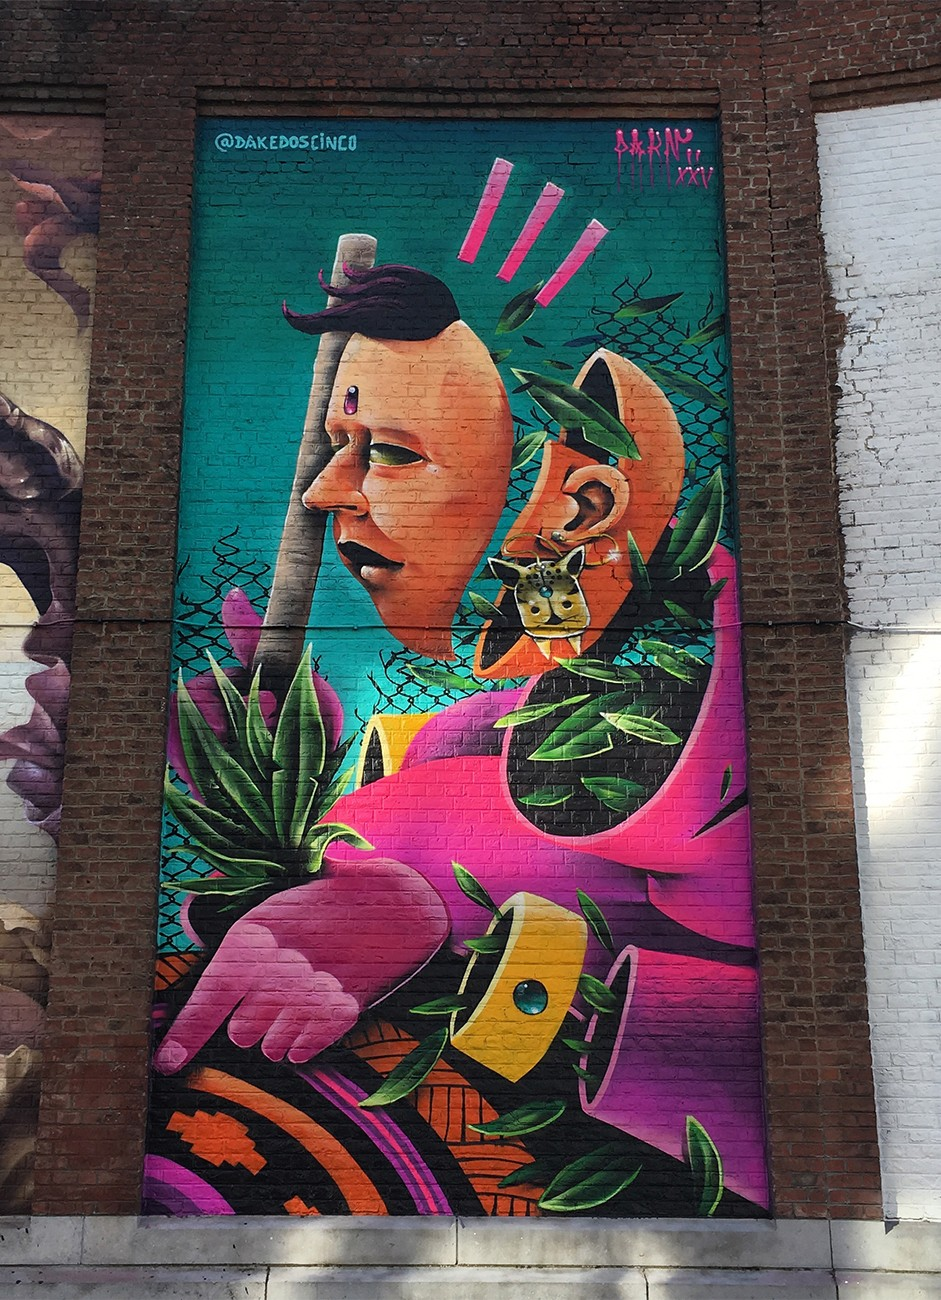 https://www.propaganza.be/wp-content/uploads/2019/04/dake-2018-propaganza-graffiti-belgium-bruxelles-4.jpg